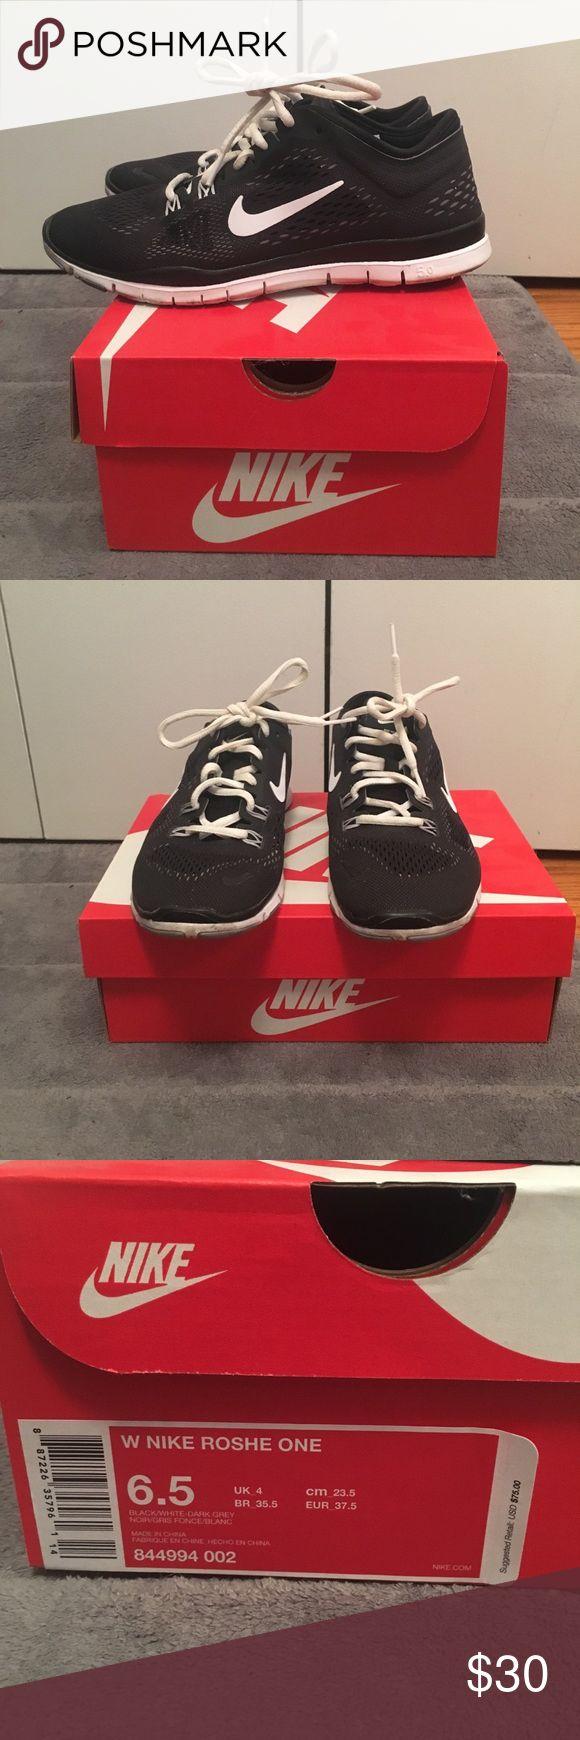 Black Nike Roshe black nike roshe one, wide, size 6.5, worn ONCE Nike Shoes Sneakers